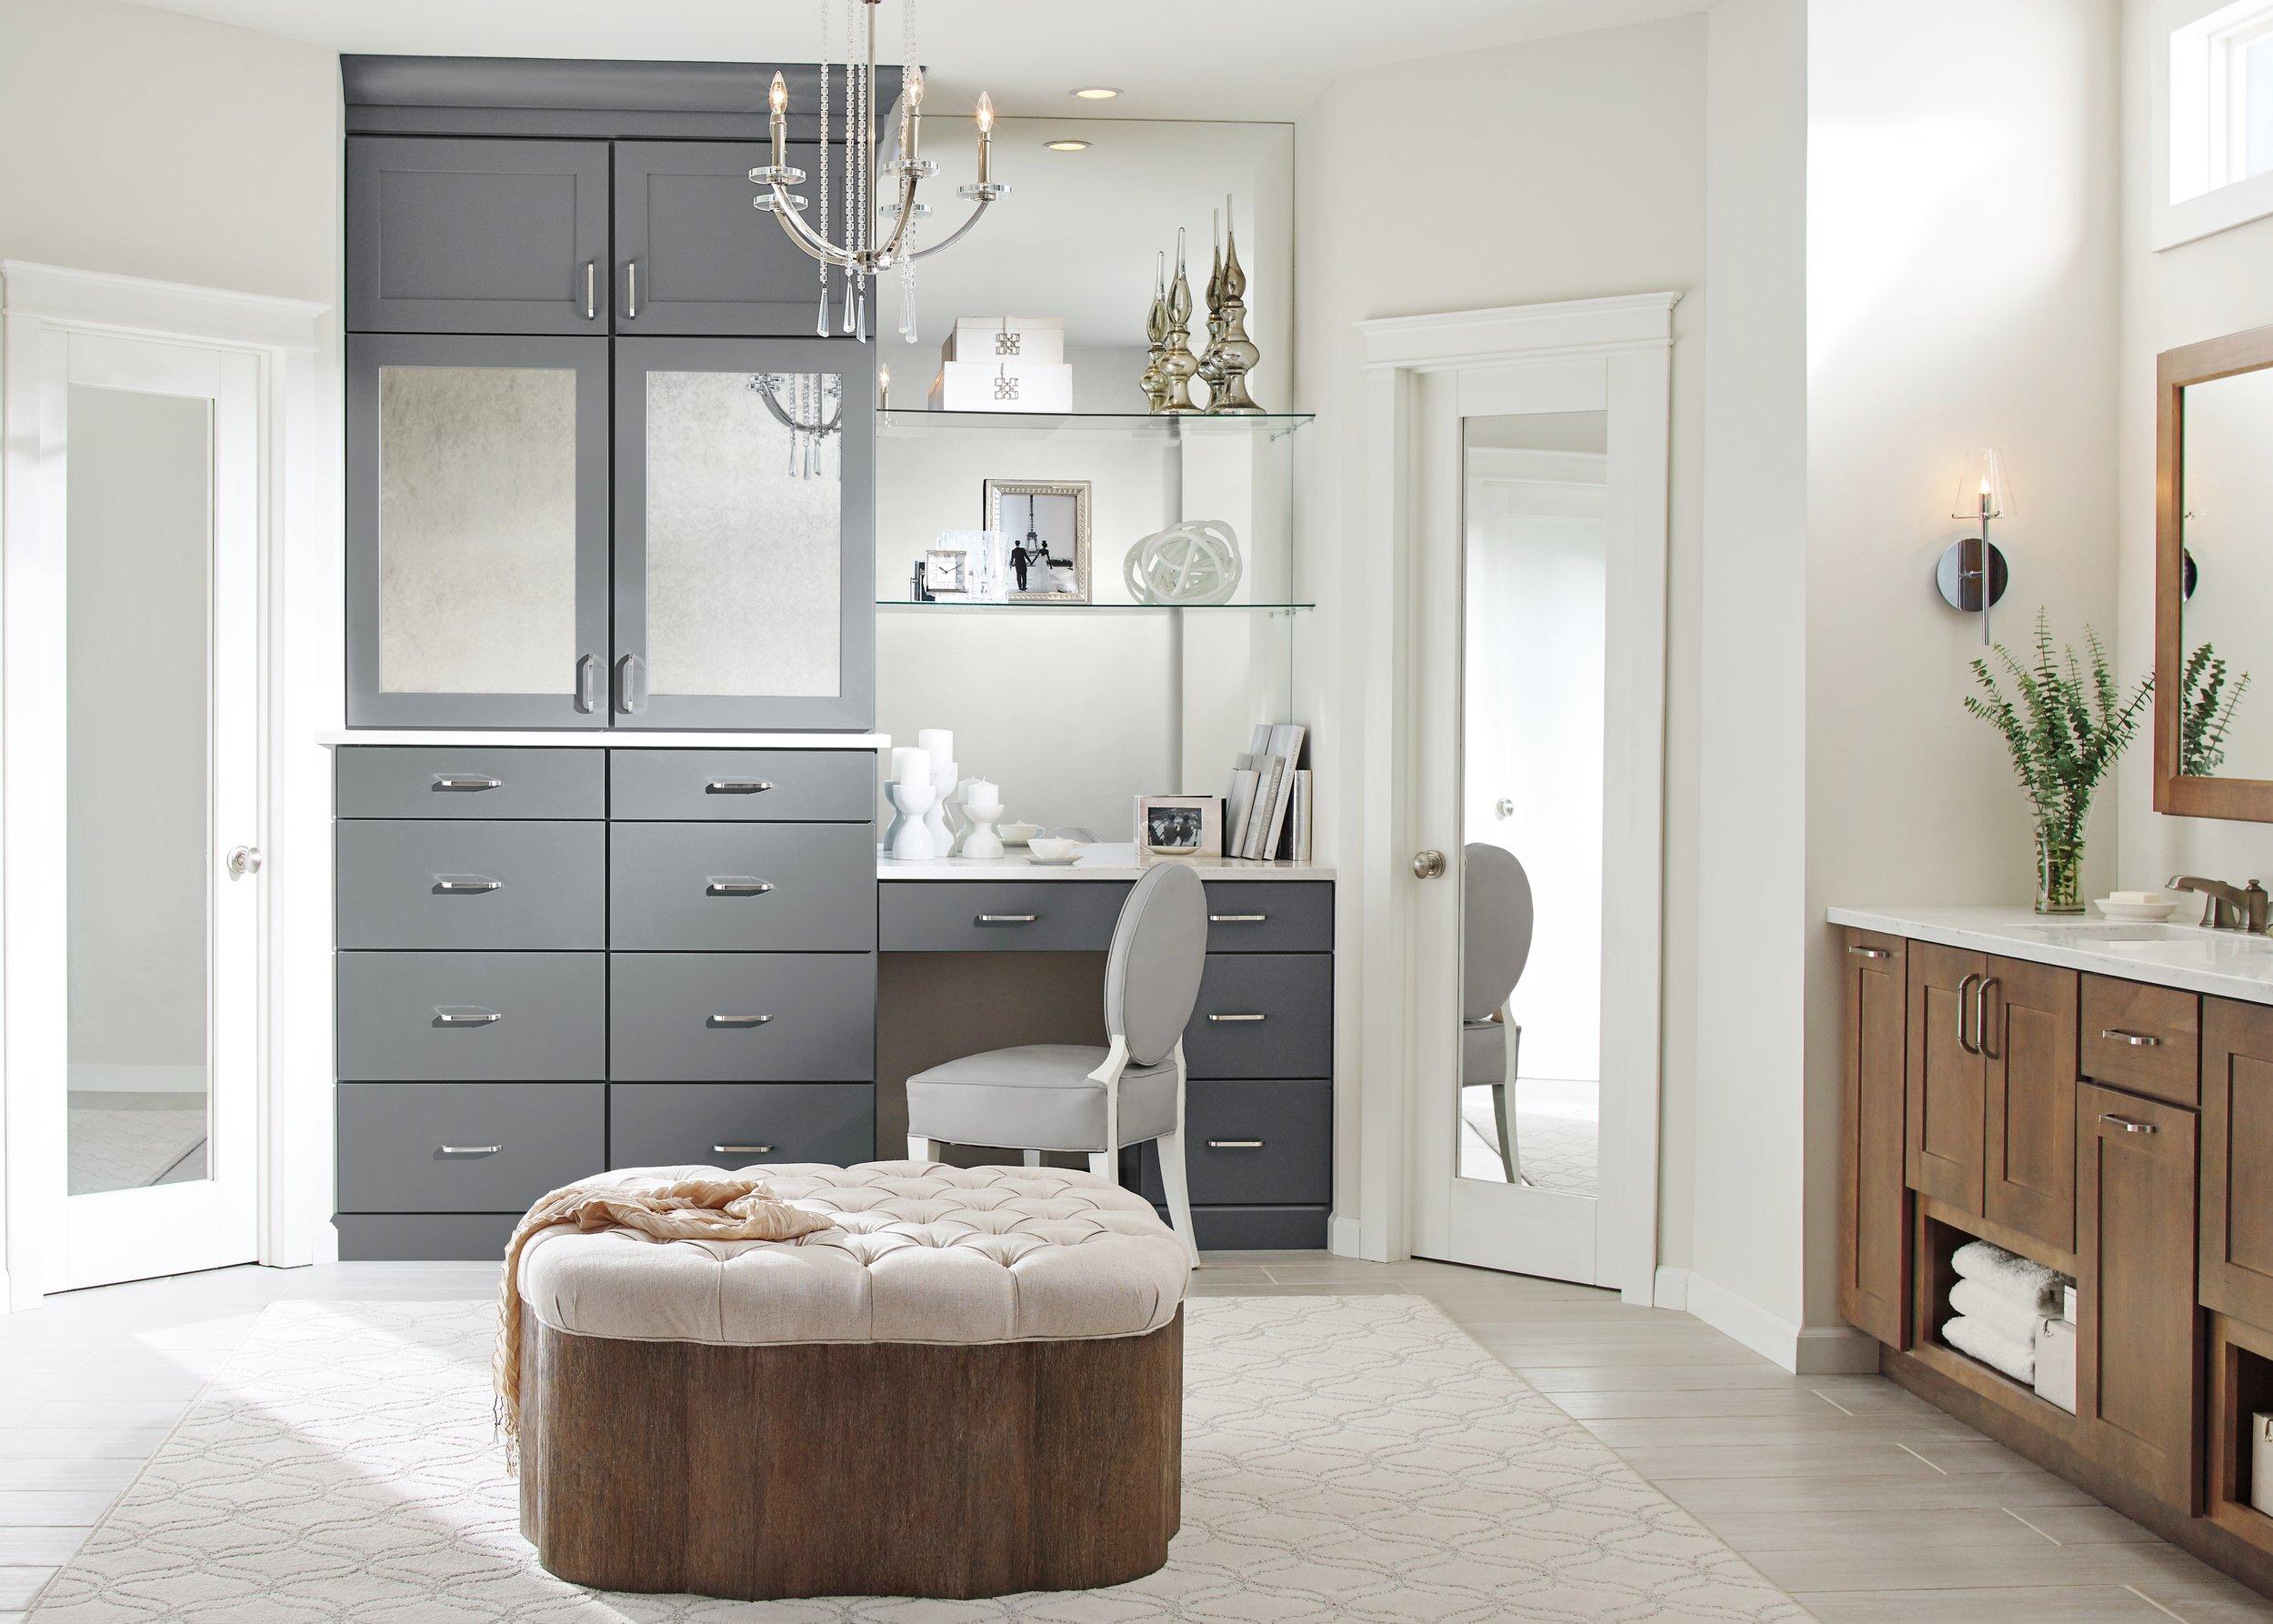 Nicole Janes Design Diamond Cabinets Gray Bathroom Vanity Makeup Counter Mirror